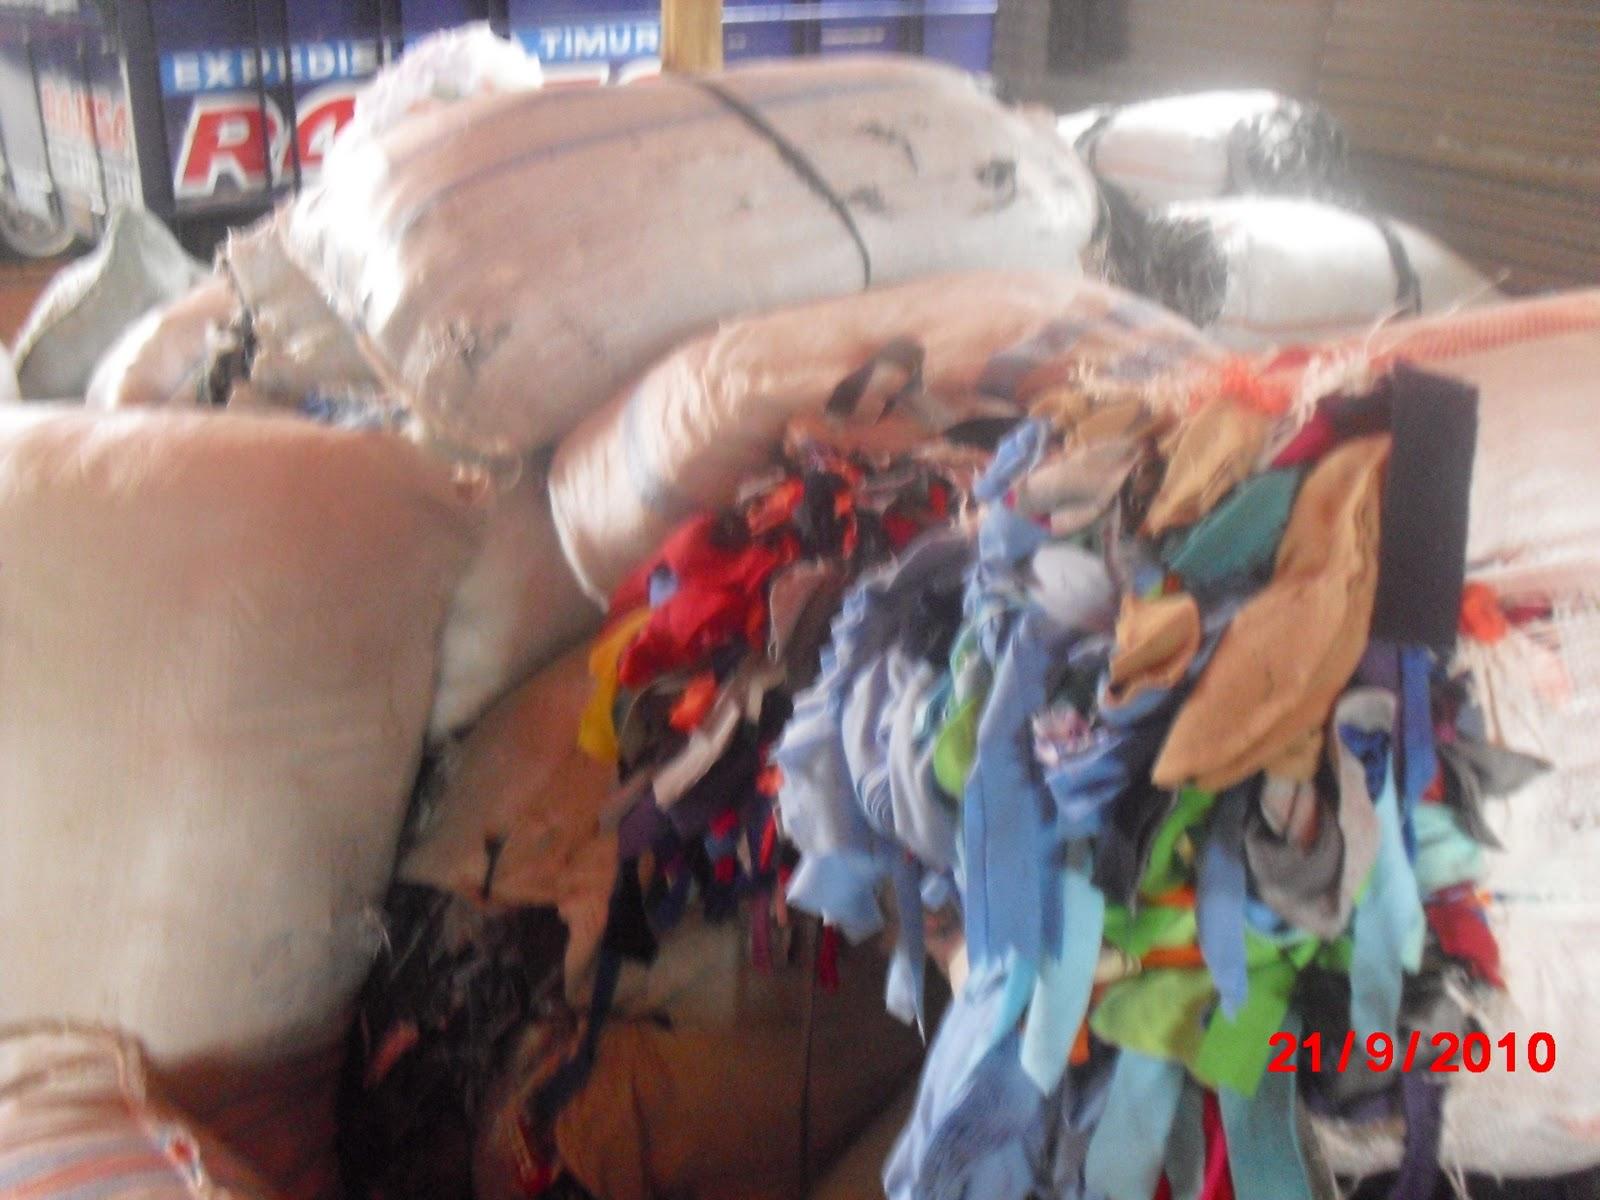 Usaha Limbah Garmen Konveksi Pabrik Seperti Potongan Blue Jeans Kain Lap Jahit Warna Dan Katun Putih Polos